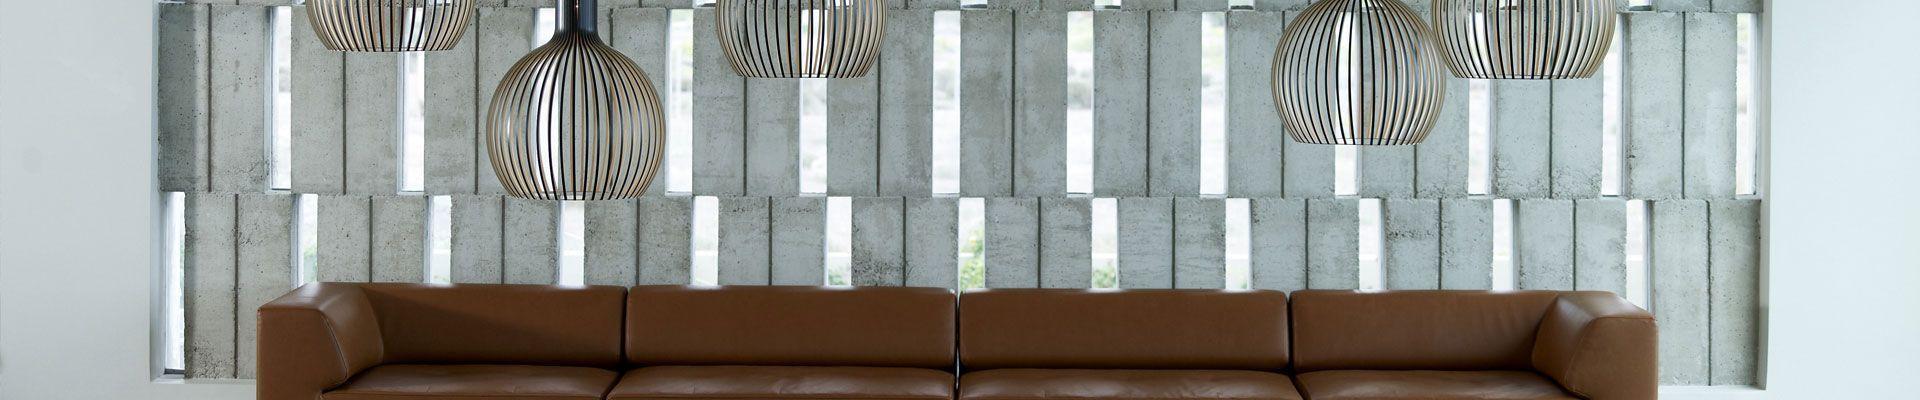 Interieurproject: Vin Perdu